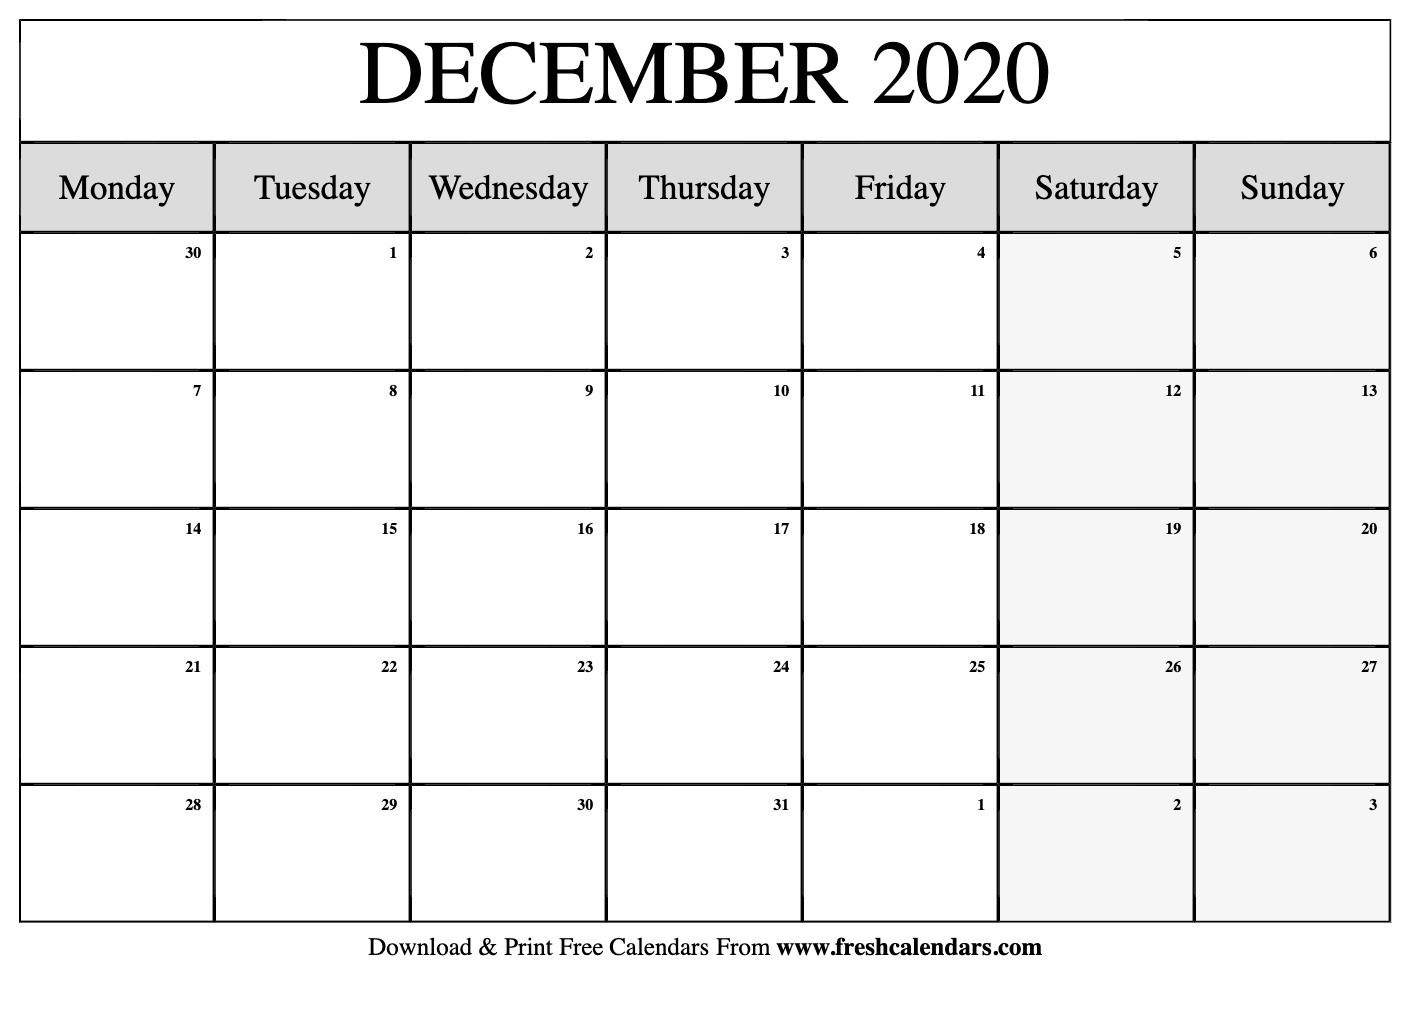 Free Printable December 2020 Calendar-Blank Monthly Calendar Monday Start